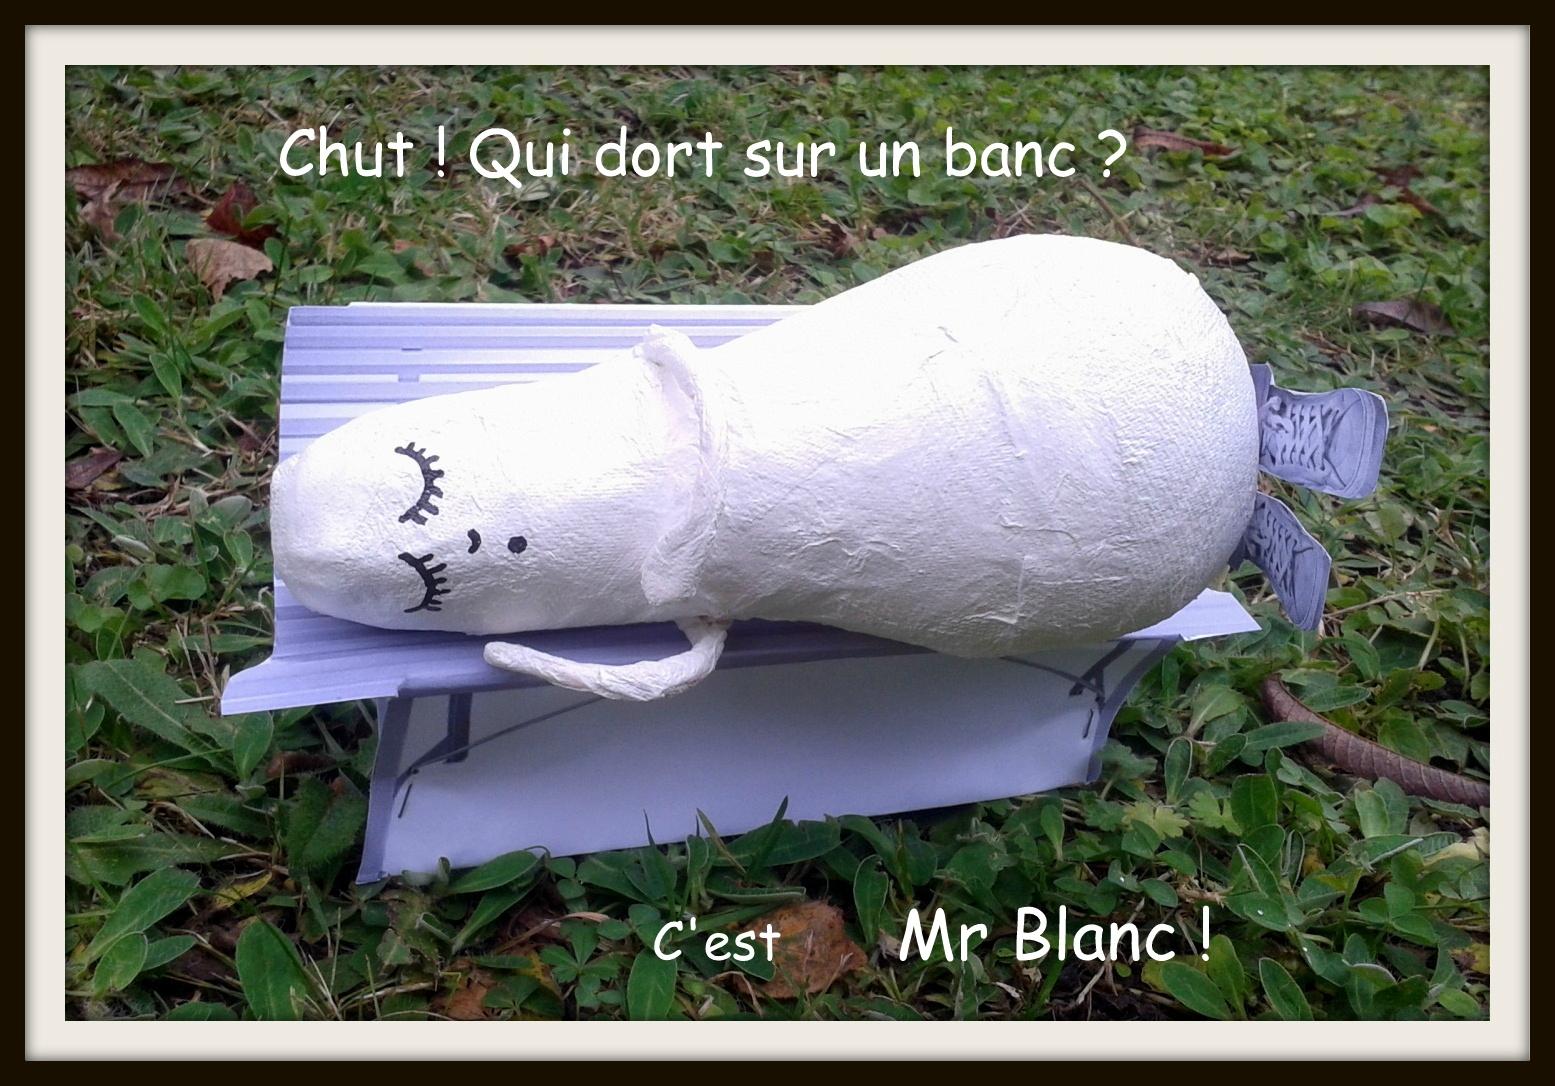 monsieur blanc